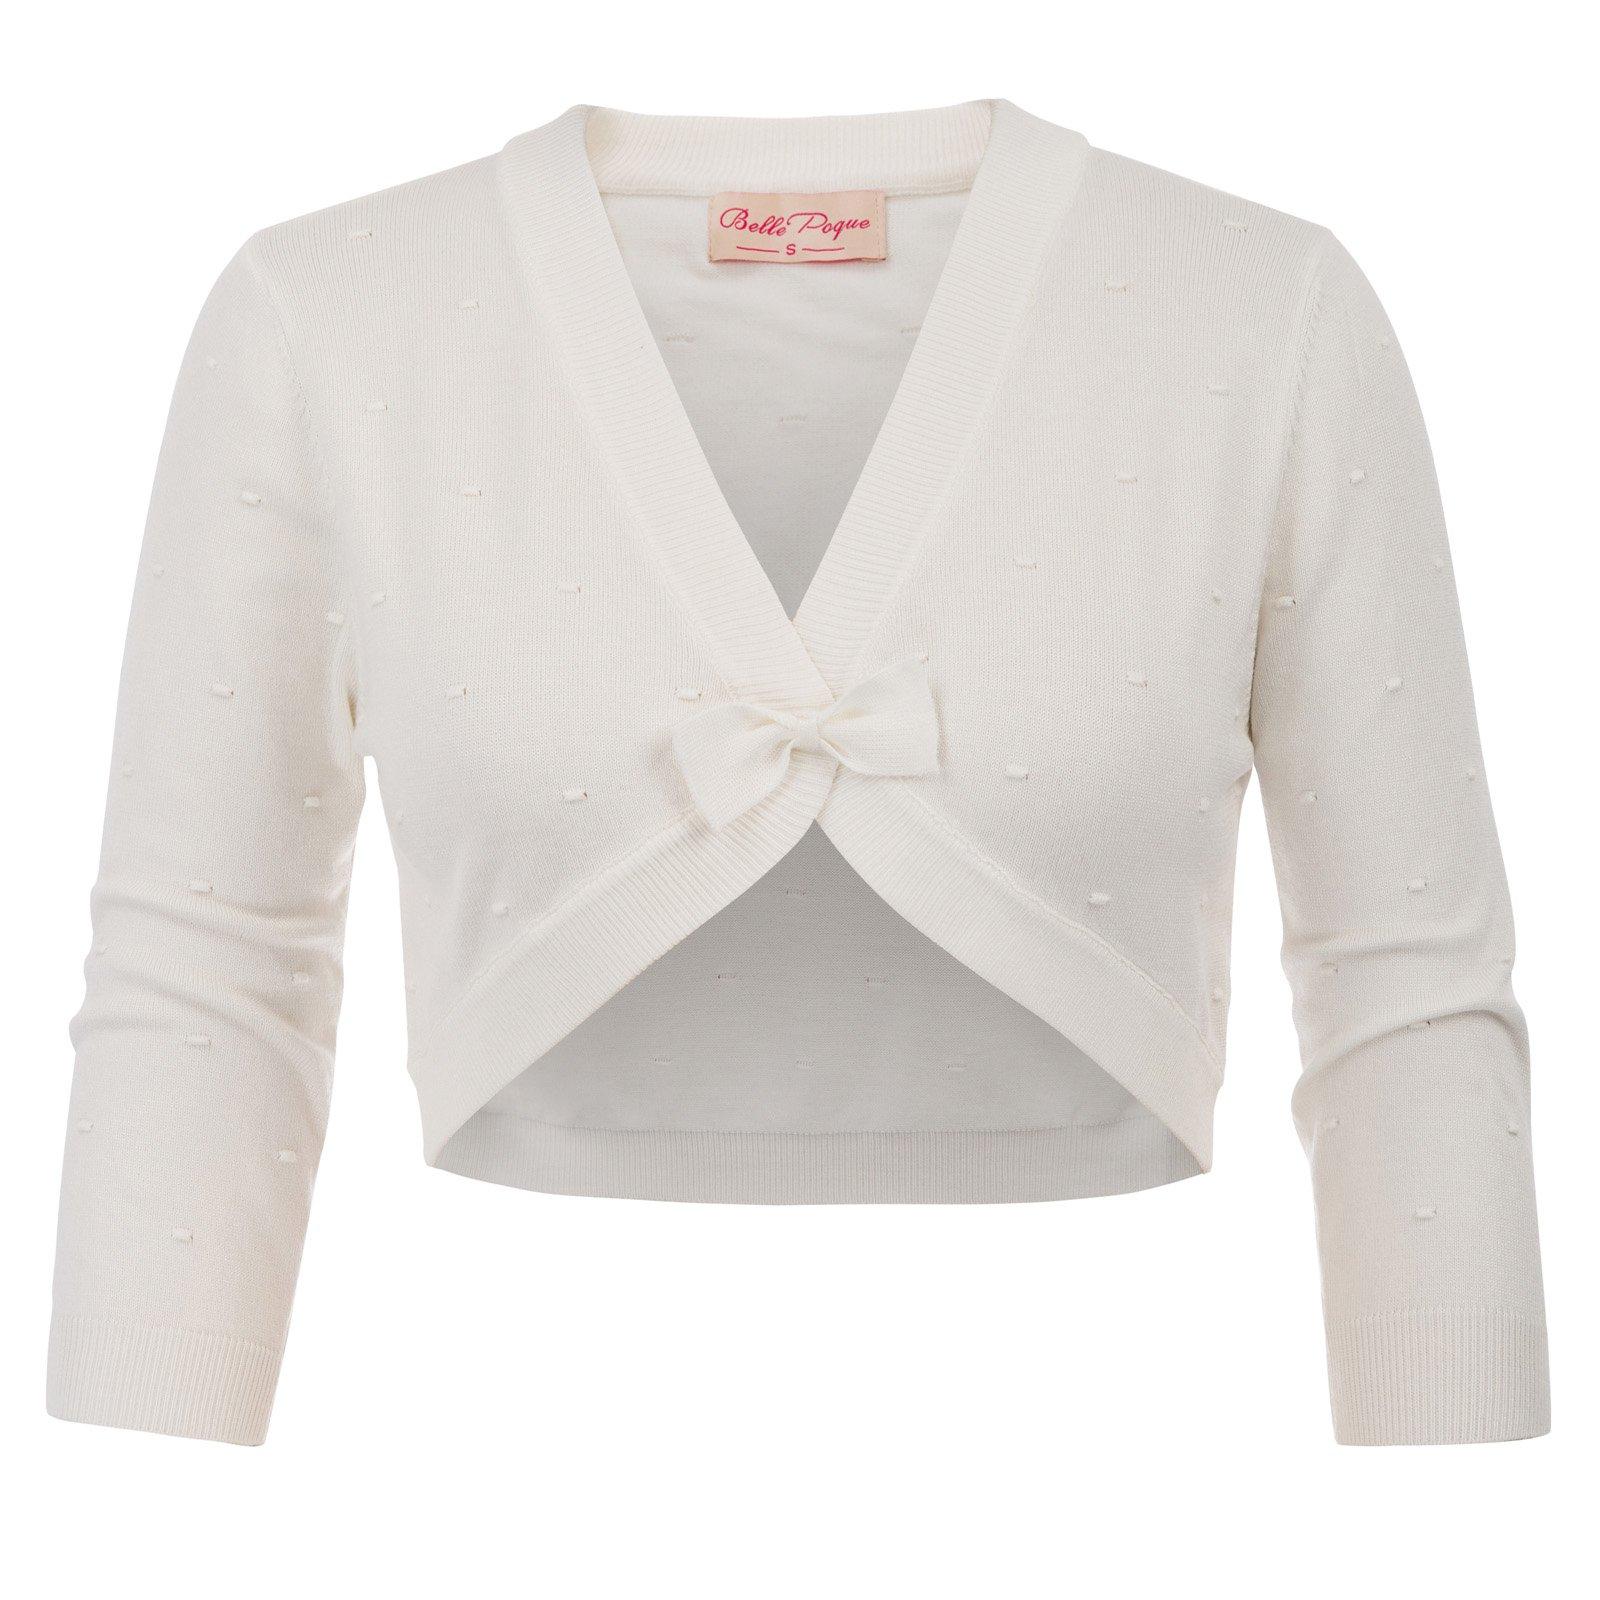 Belle Poque White Shrugs Stretchy Cropped Open Front Shrug Bolero L BP707-2